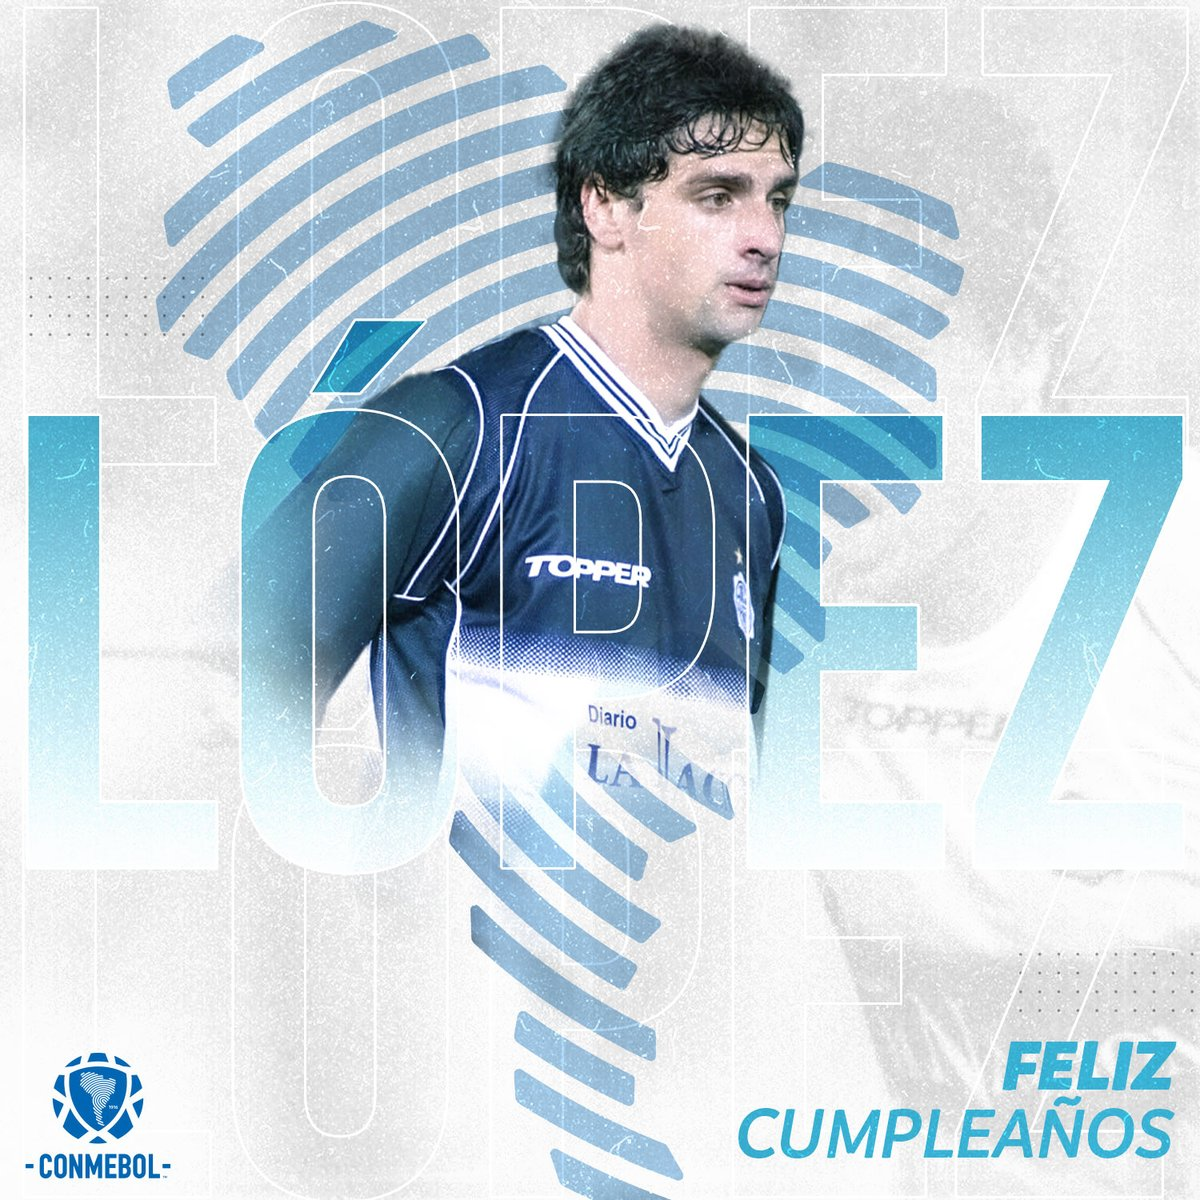 Hoy está de cumpleaños Hernán Rodrigo López un campeón 🏆 de la CONMEBOL @Libertadores, @RecopaConmebol y goleador de la CONMEBOL @Sudamericana con 1️⃣6️⃣ ⚽  ¡Felicidades uruguayo! 🇺🇾🎉